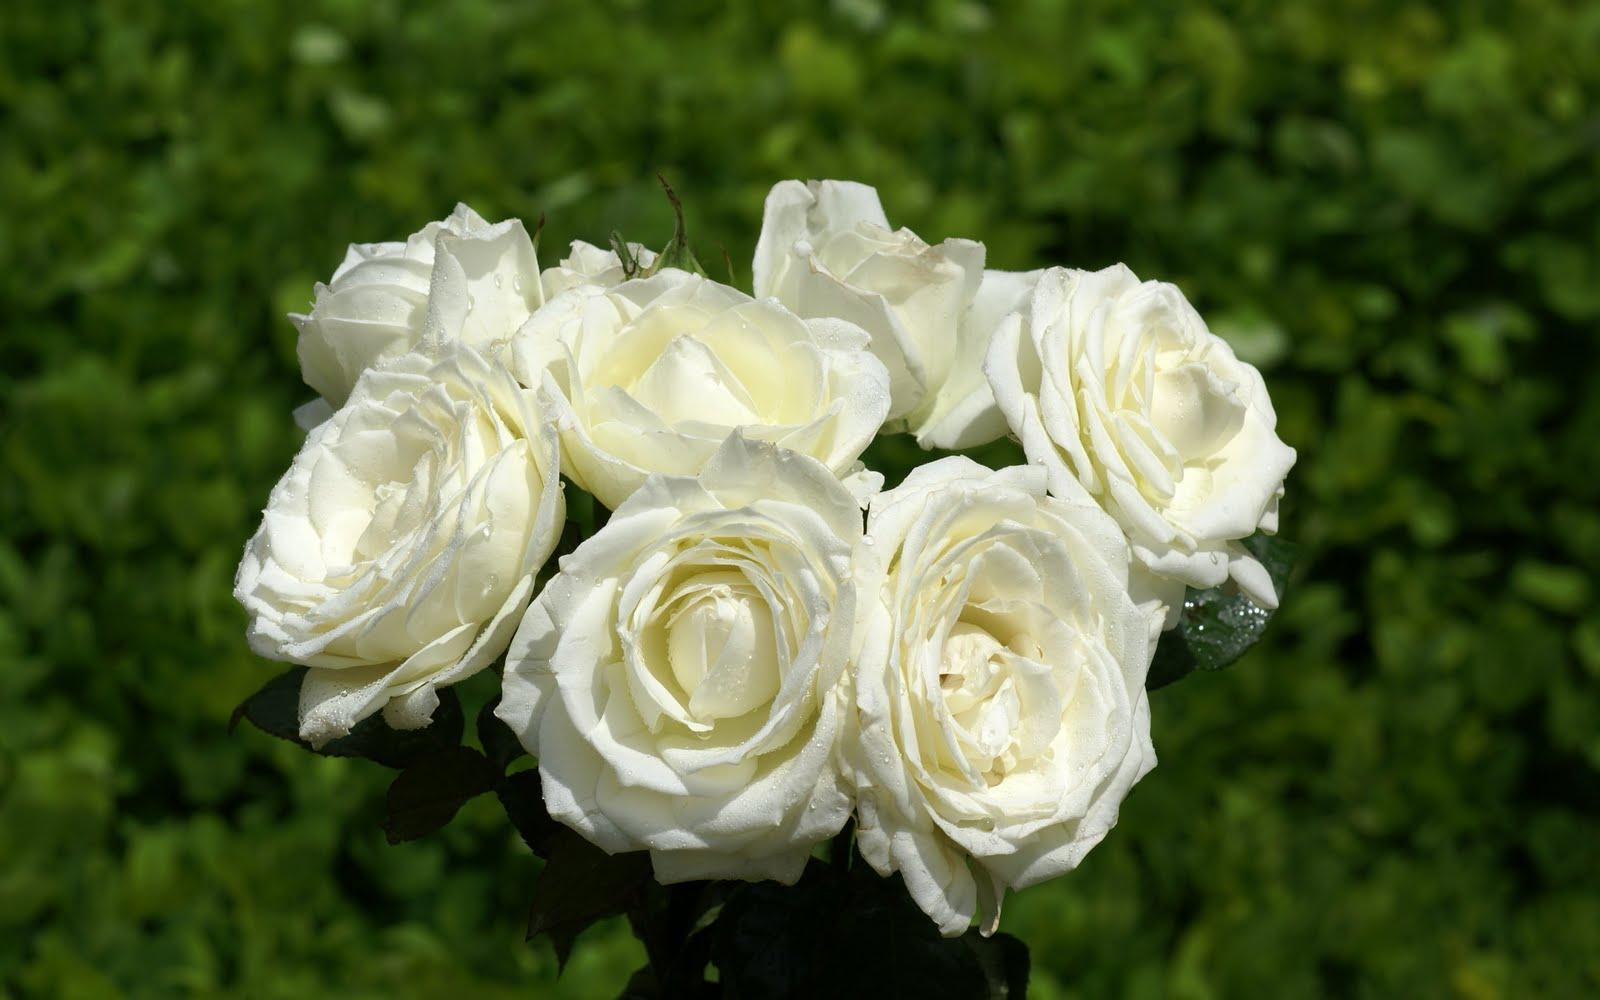 http://4.bp.blogspot.com/_BEyQraI-KQQ/SxSwtfDgjXI/AAAAAAAADtE/OJ6kCLK_0Mk/s1600/roses-dsc02449.jpg